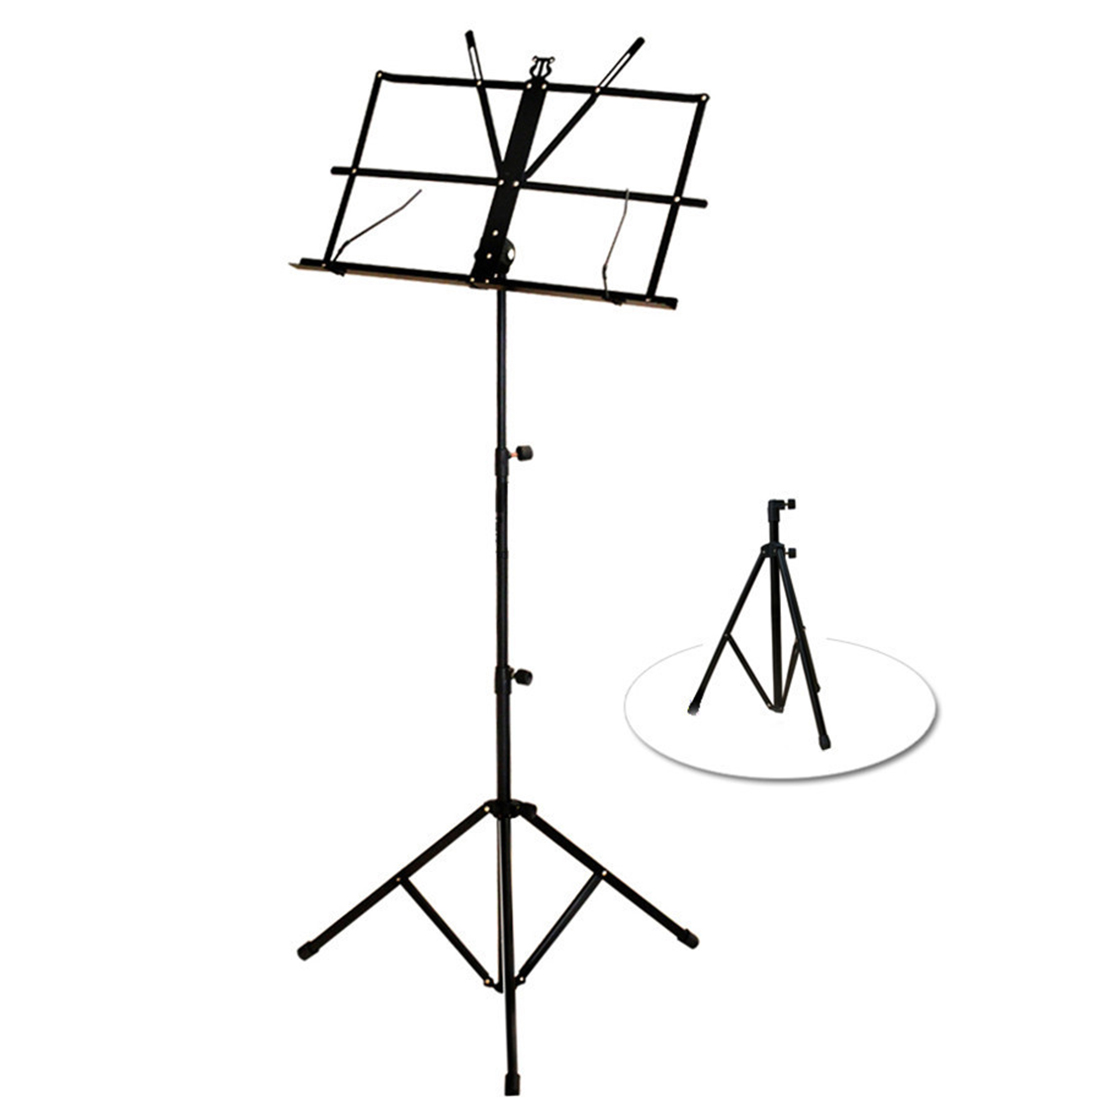 Ultra Light Foldable Adjustable Sheet Music Tripod Stand